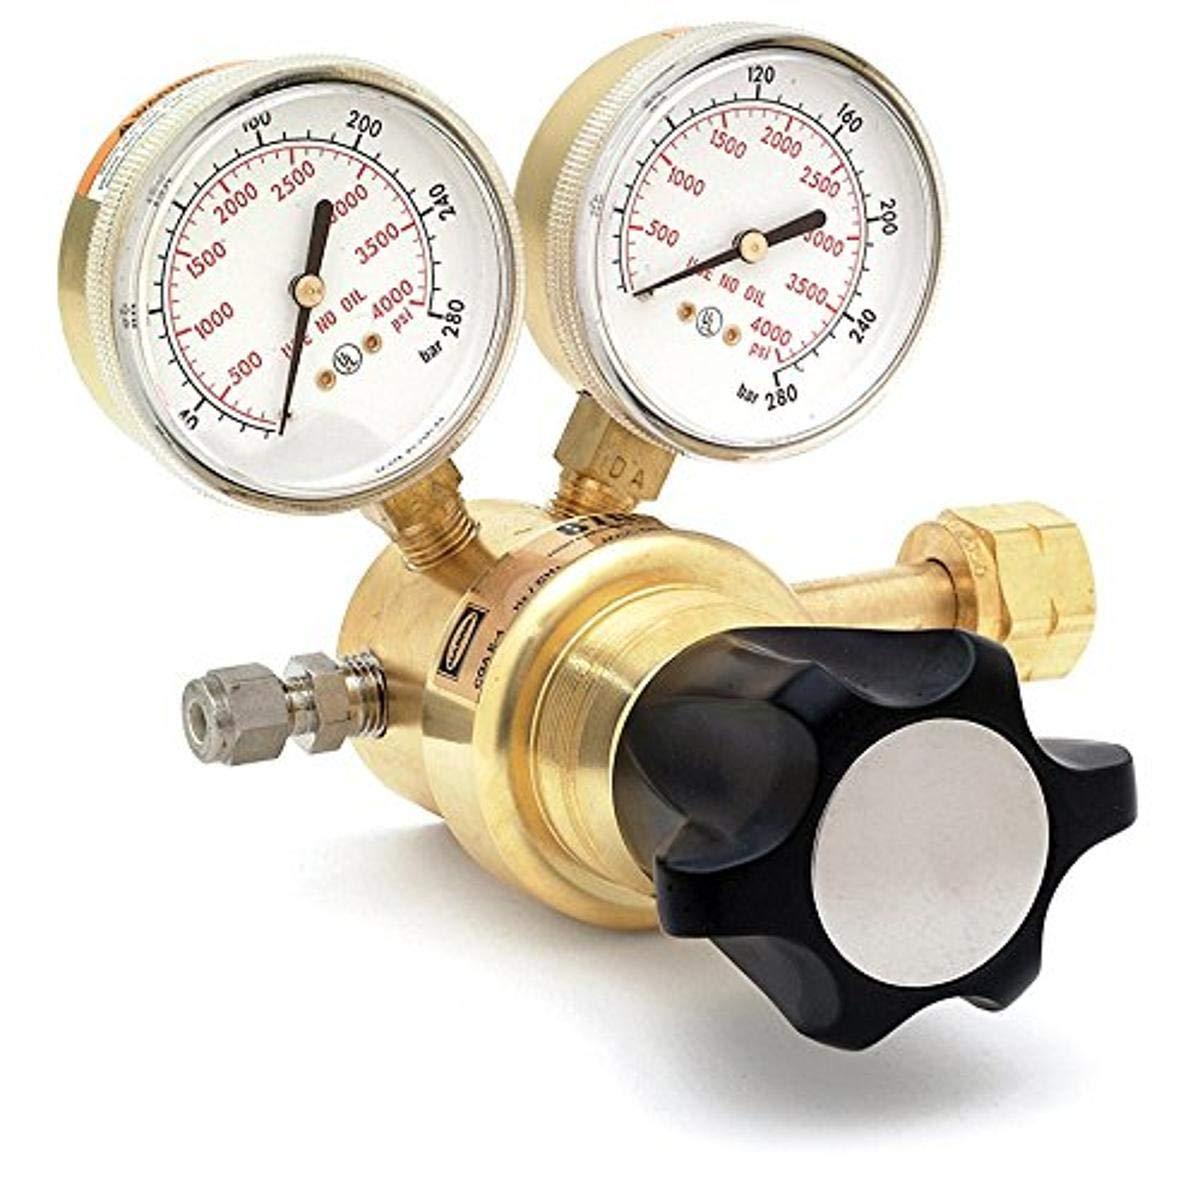 Popular product Price reduction HARRIS Spclty Gas Reg Cylinder Ar He CGA-580 N